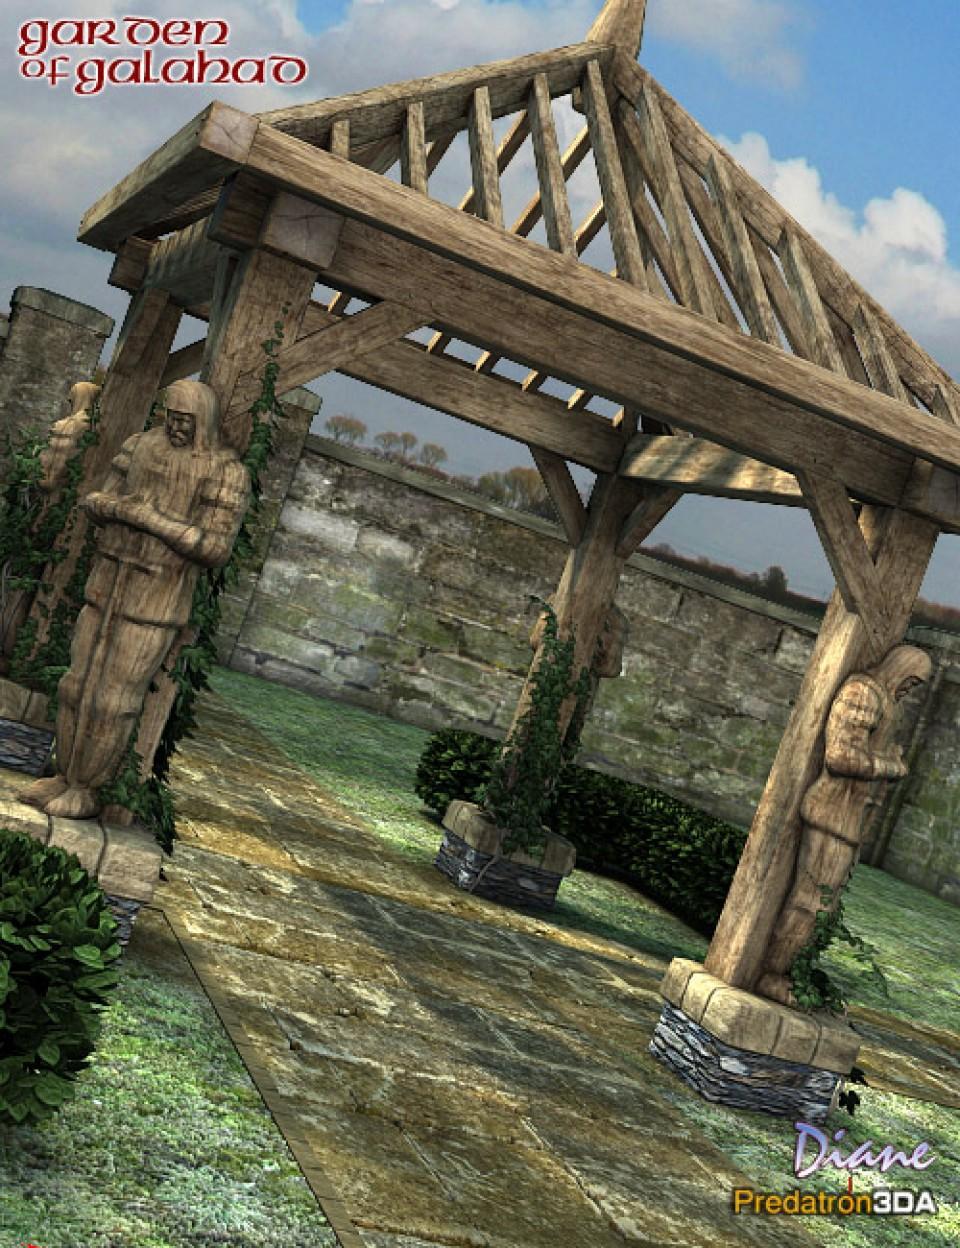 Garden of Galahad